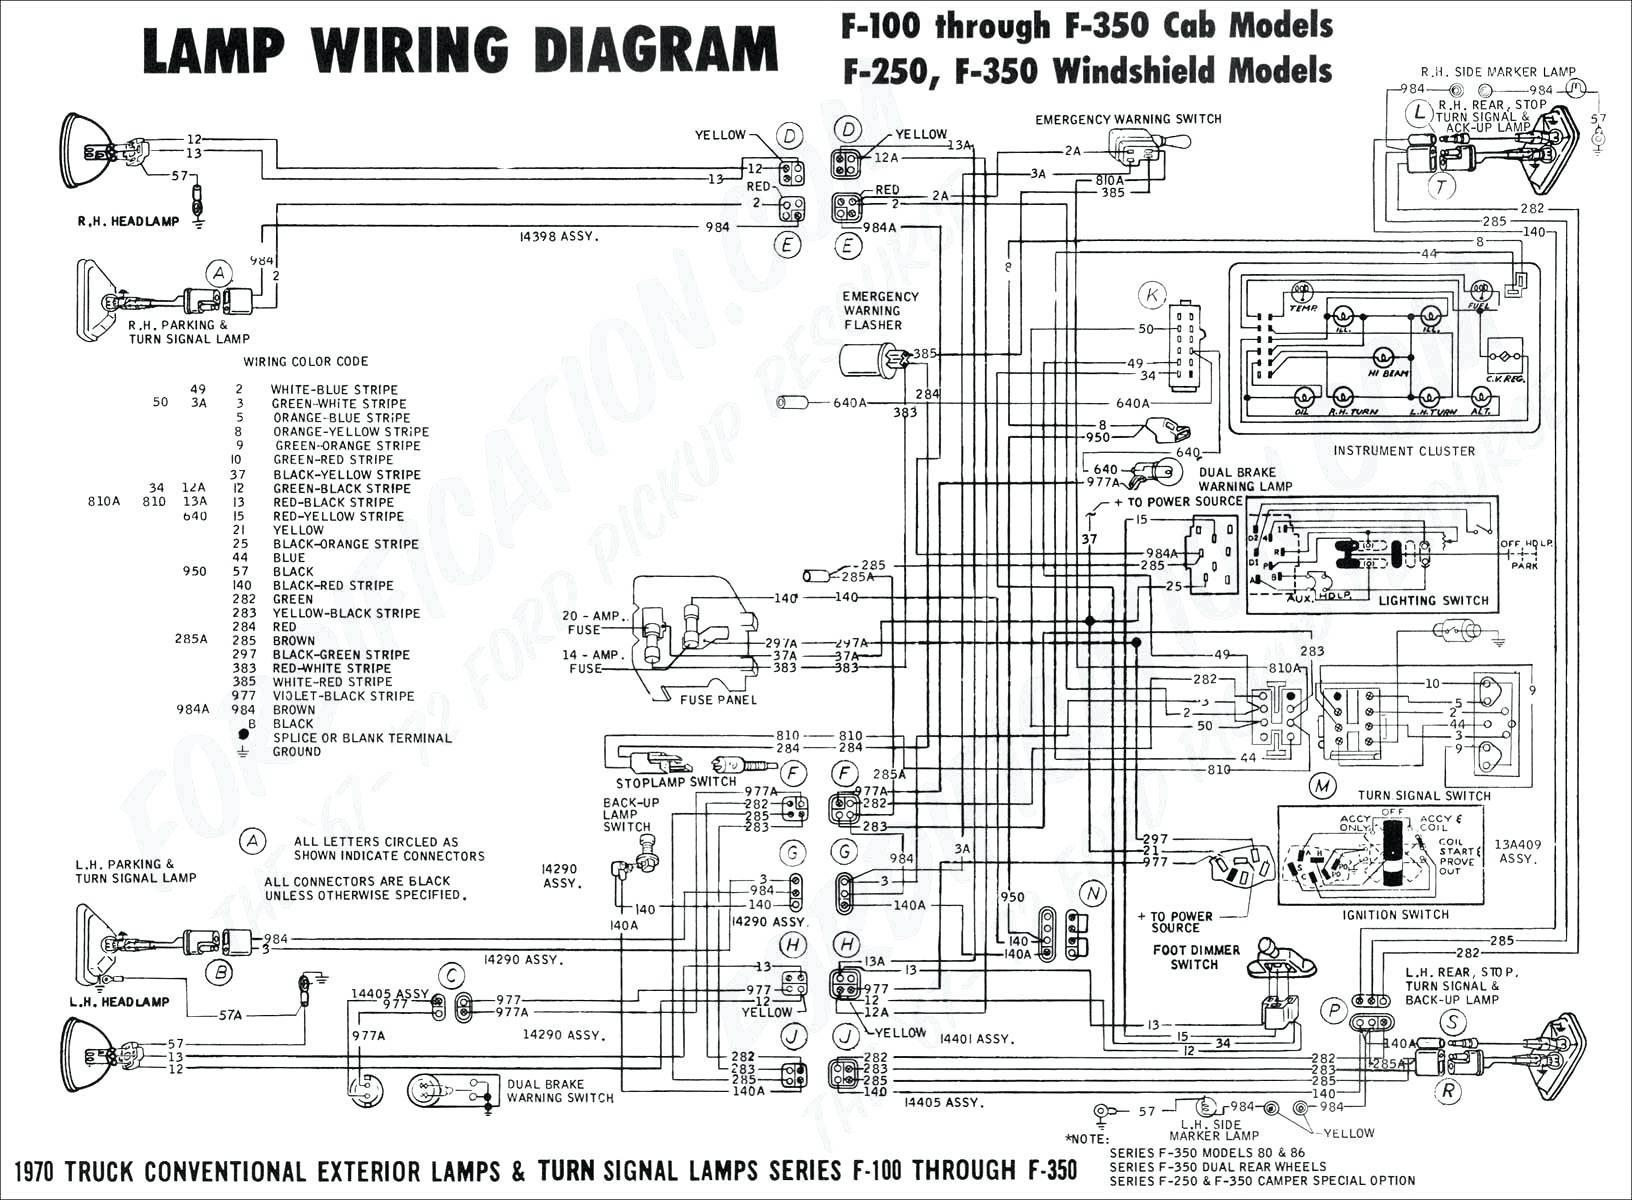 Bose Amp Wiring Diagram Manual | Free Wiring Diagram B Amp Wiring Diagrams on subwoofer diagram, amp wiring chart, amp power, amp installation diagram, amp wiring kit, car amp diagram, amp plug, amp connectors diagram, amp help, amp circuit, speakers diagram, navigation diagram, 2001 nissan maxima fuse box diagram, ipod diagram, amp schematic, radio diagram, amp install, circuit diagram, amp fuse, amp wire,